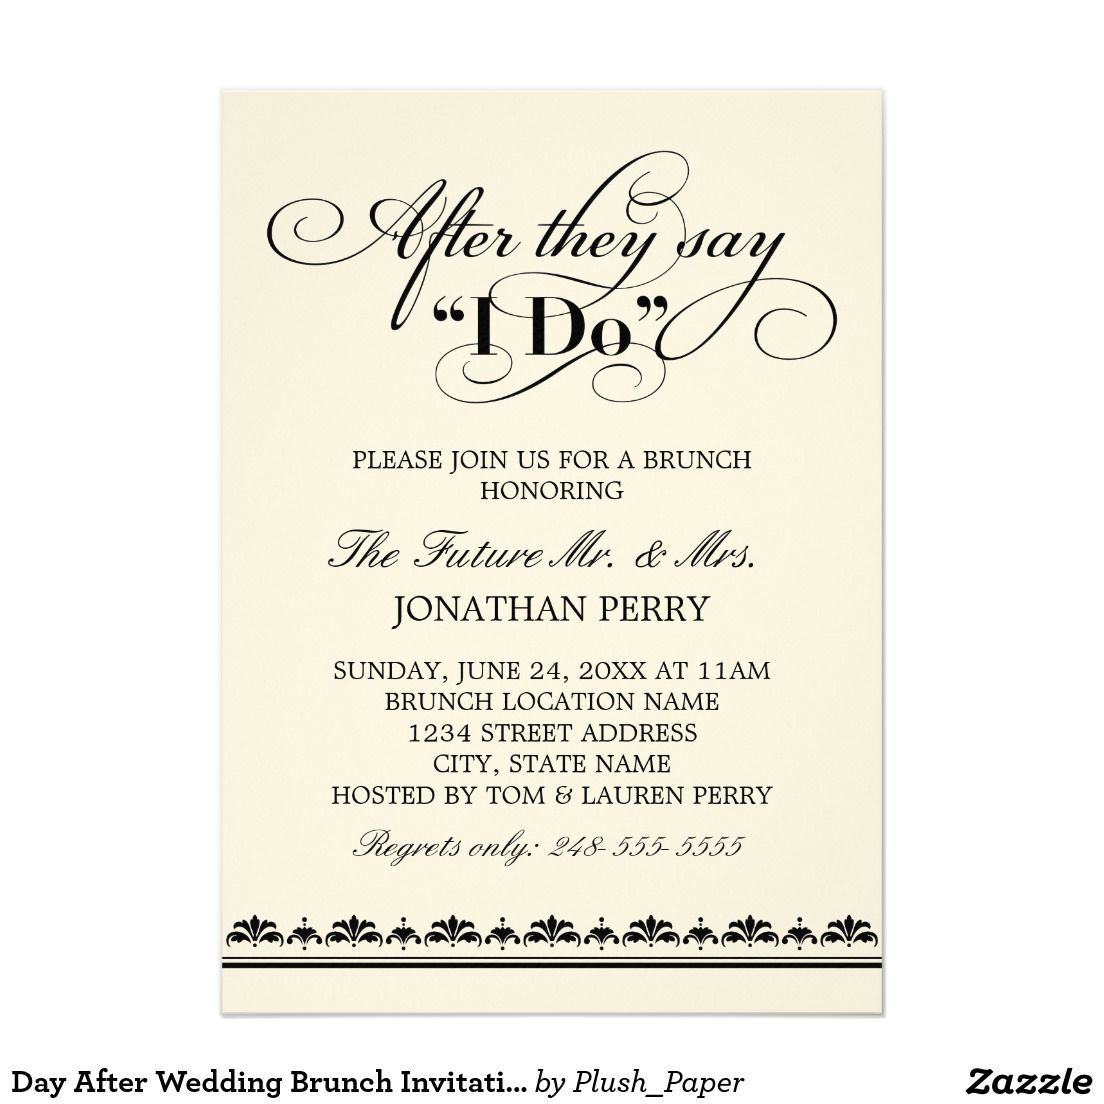 Day After Wedding Brunch Invitation Vows